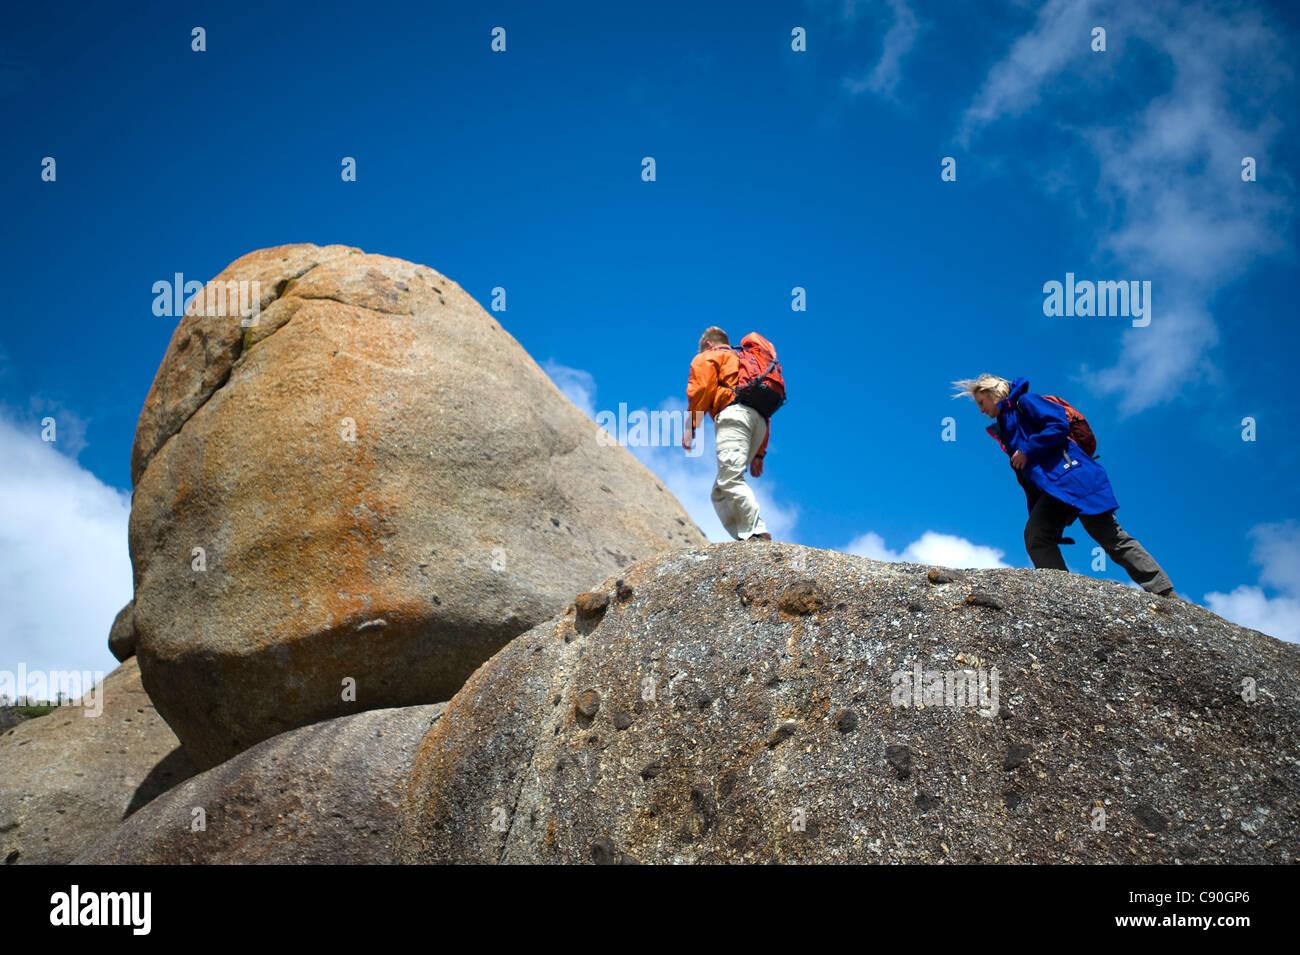 Granite rocks, Whisky Bay, Wilsons Promontory National Park, Victoria, Australia - Stock Image